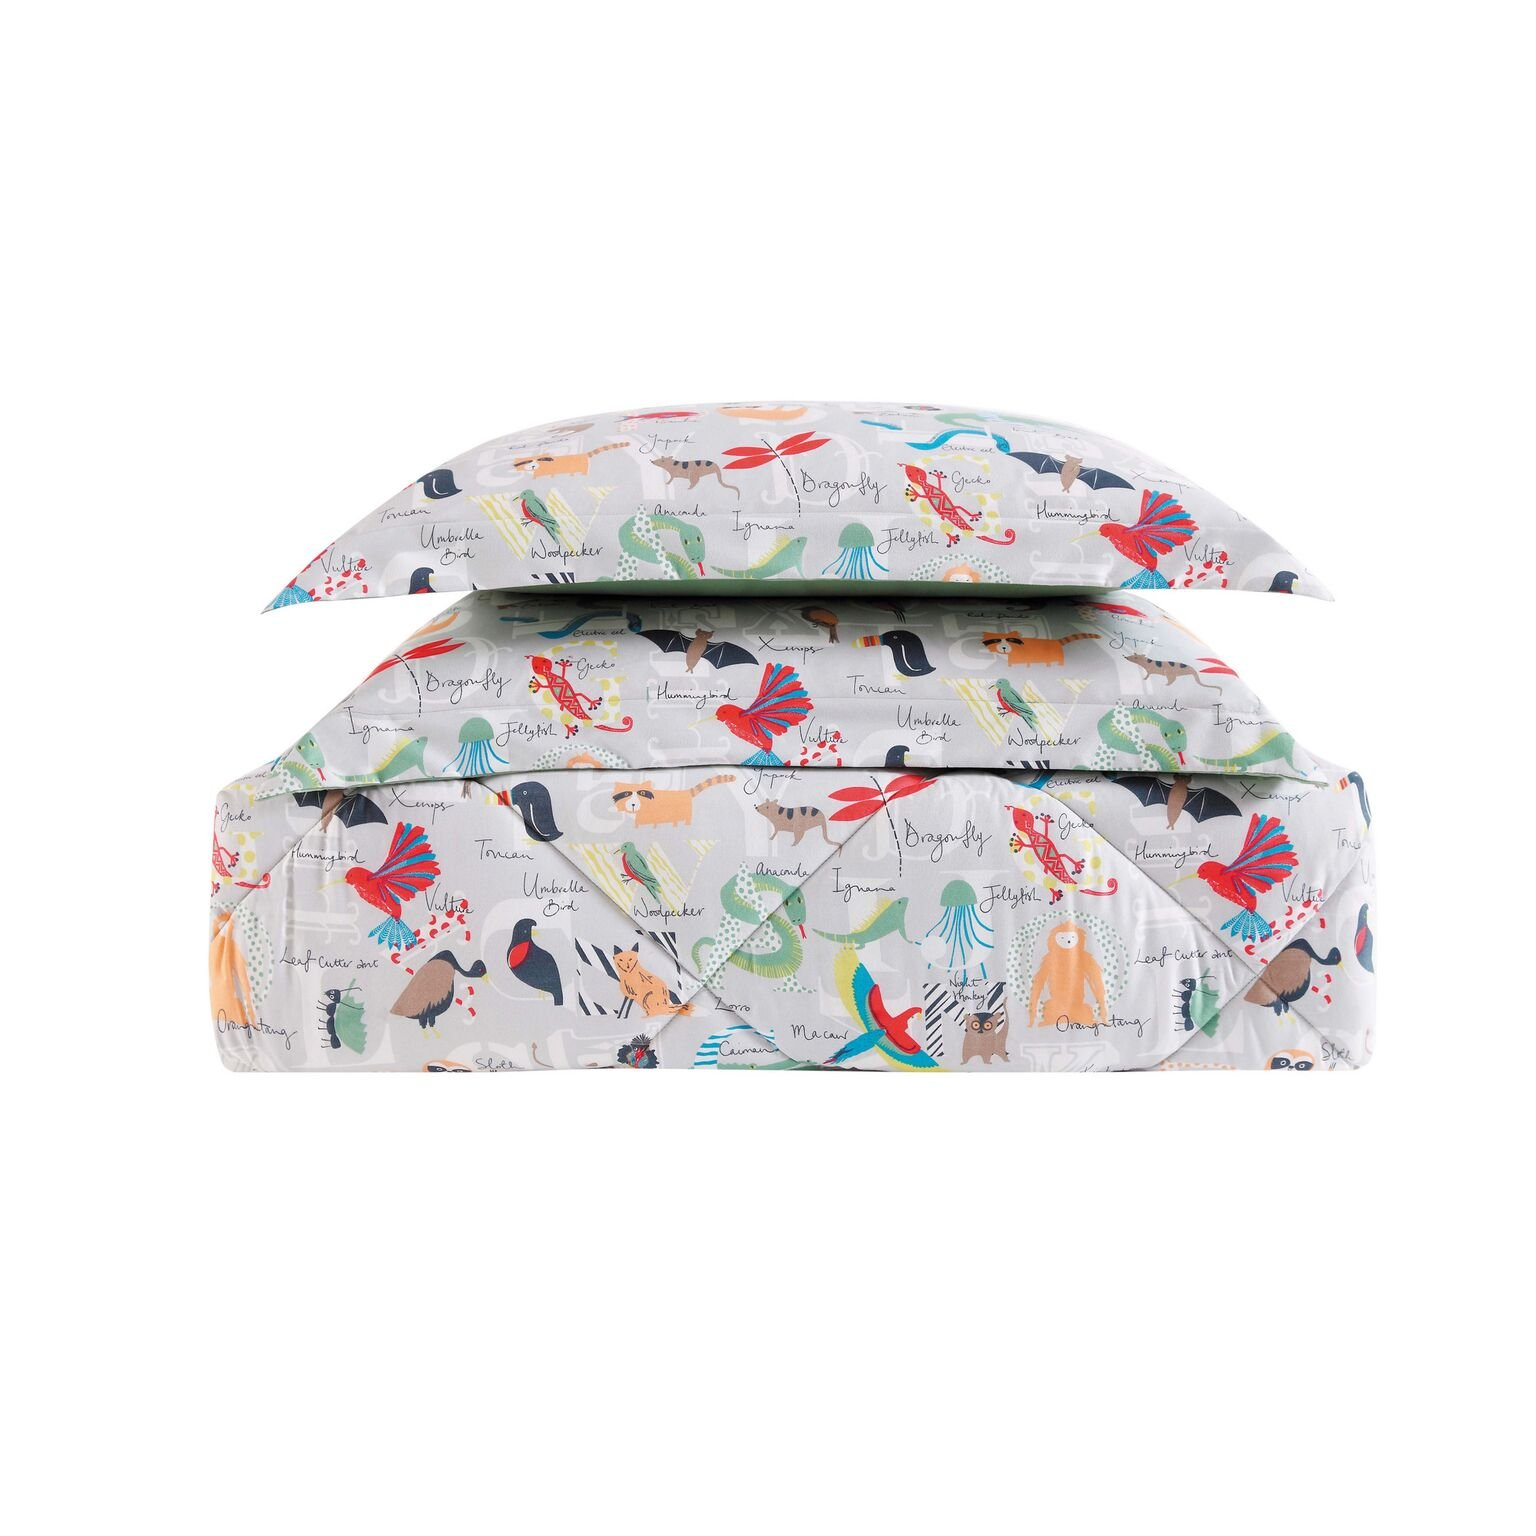 Laura Hart Kids Comforter Set, Twin/Twin XL, Animal Alphabet by Laura Hart Kids (Image #3)